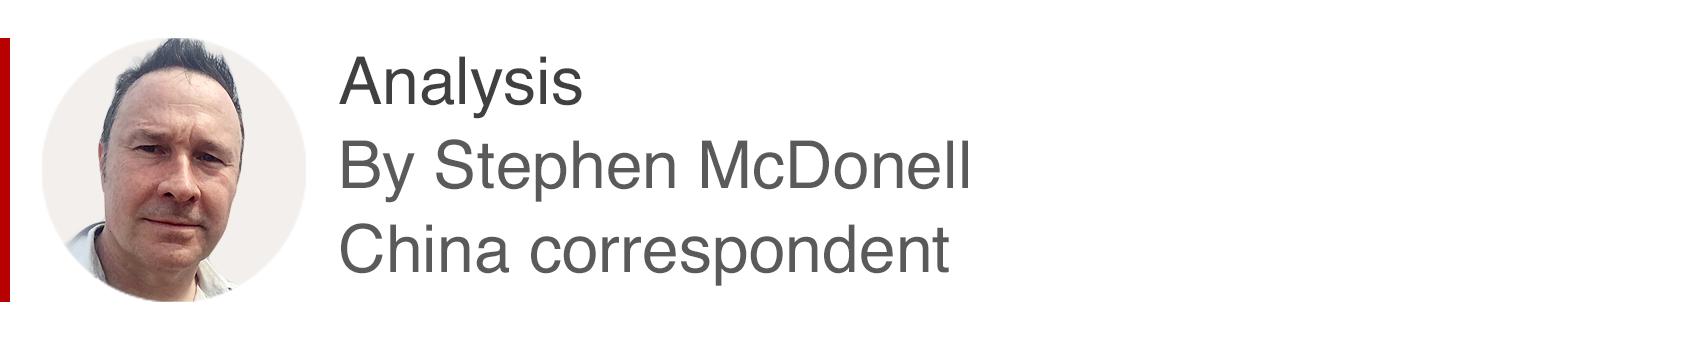 Analysis box by Stephen McDonell, China correspondent